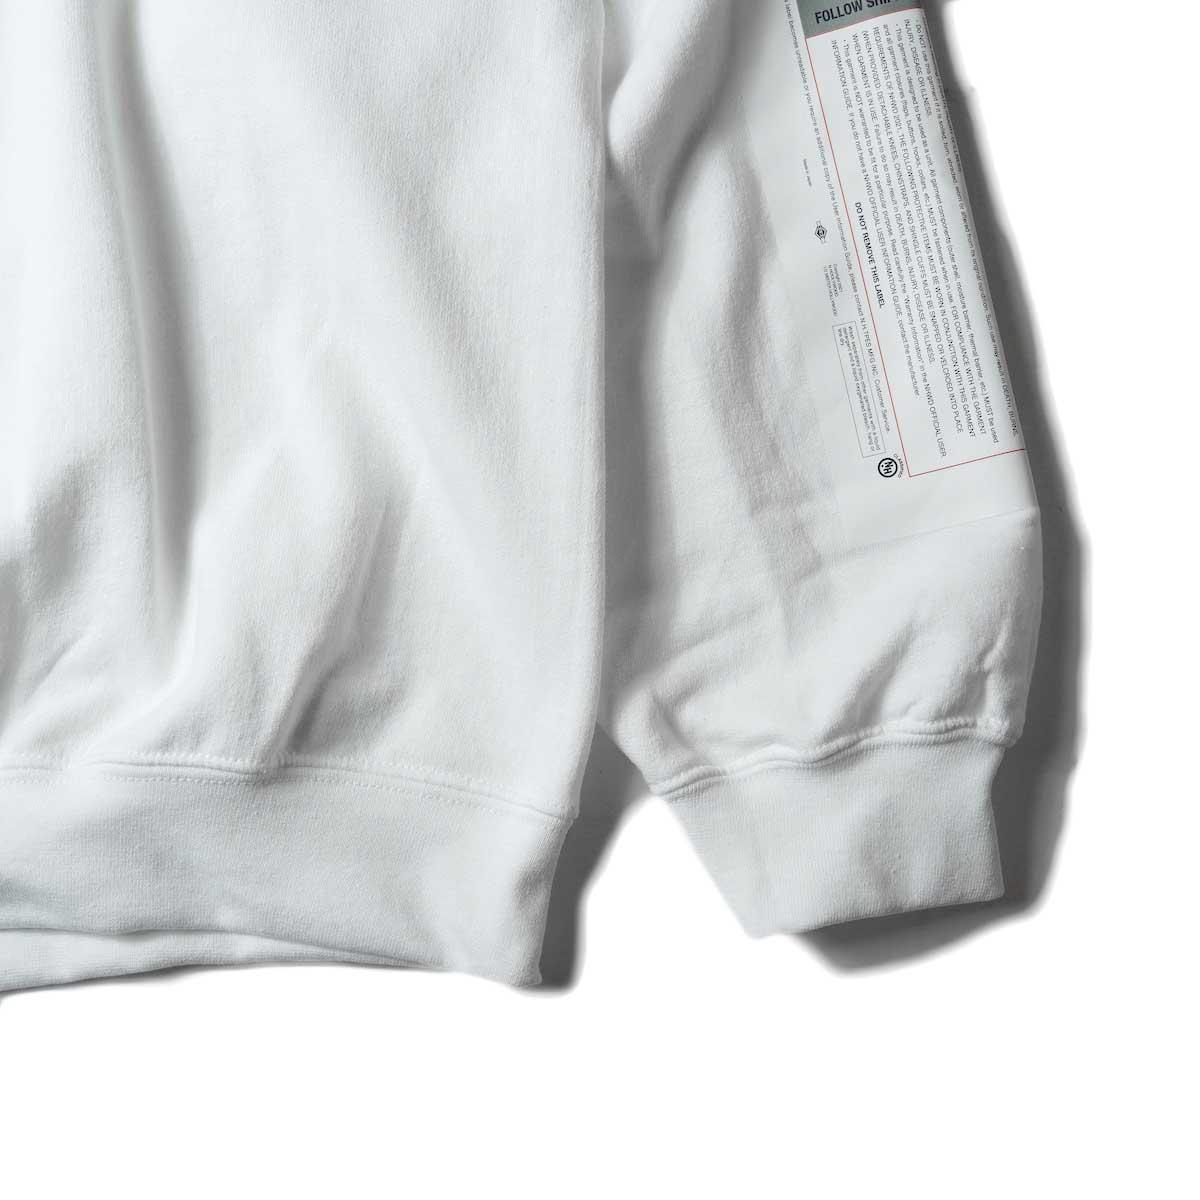 N.HOOLYWOOD / 9212-CS85 Crew Neck Sweat Shirt (White)袖、裾